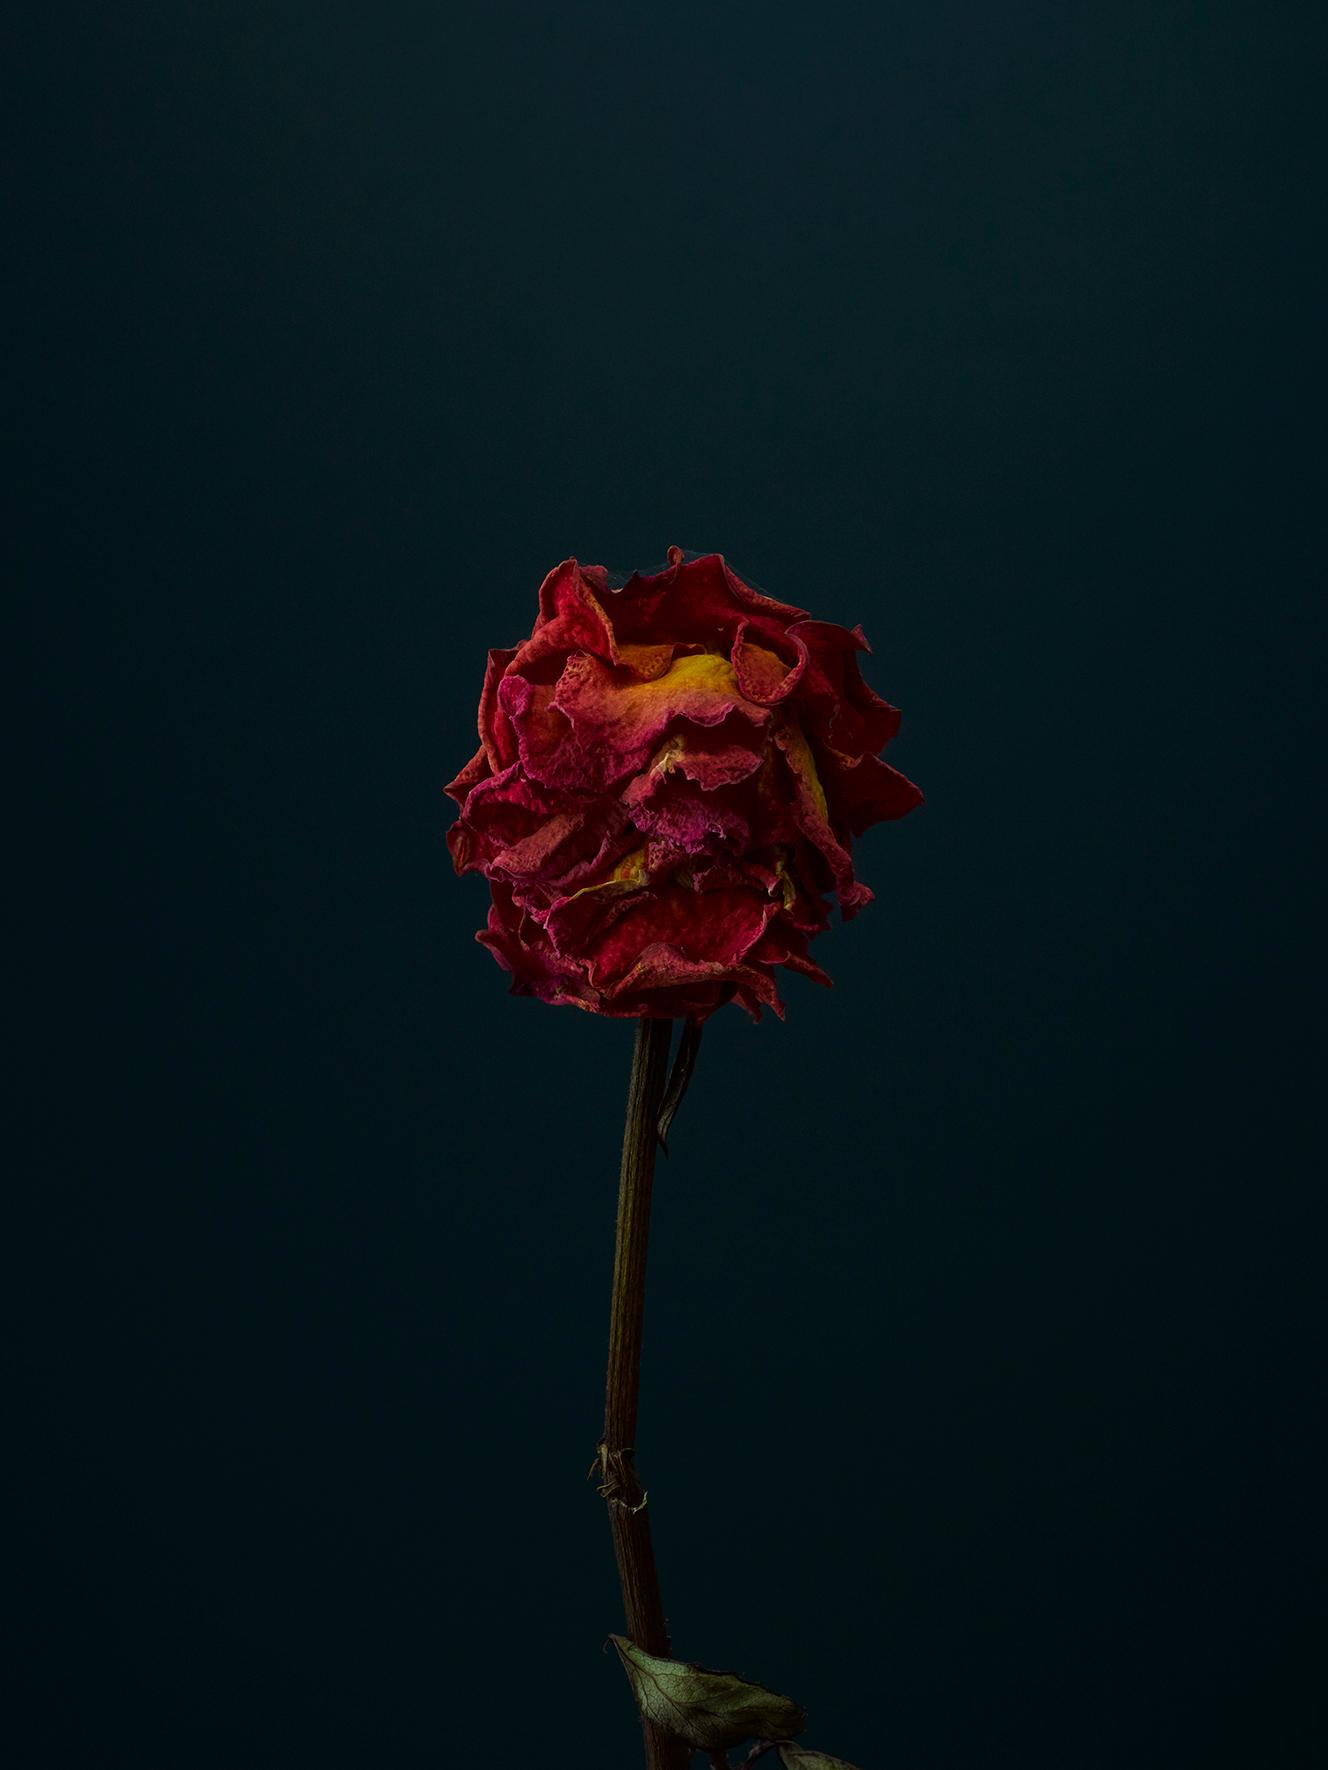 rose-5-copy.jpg